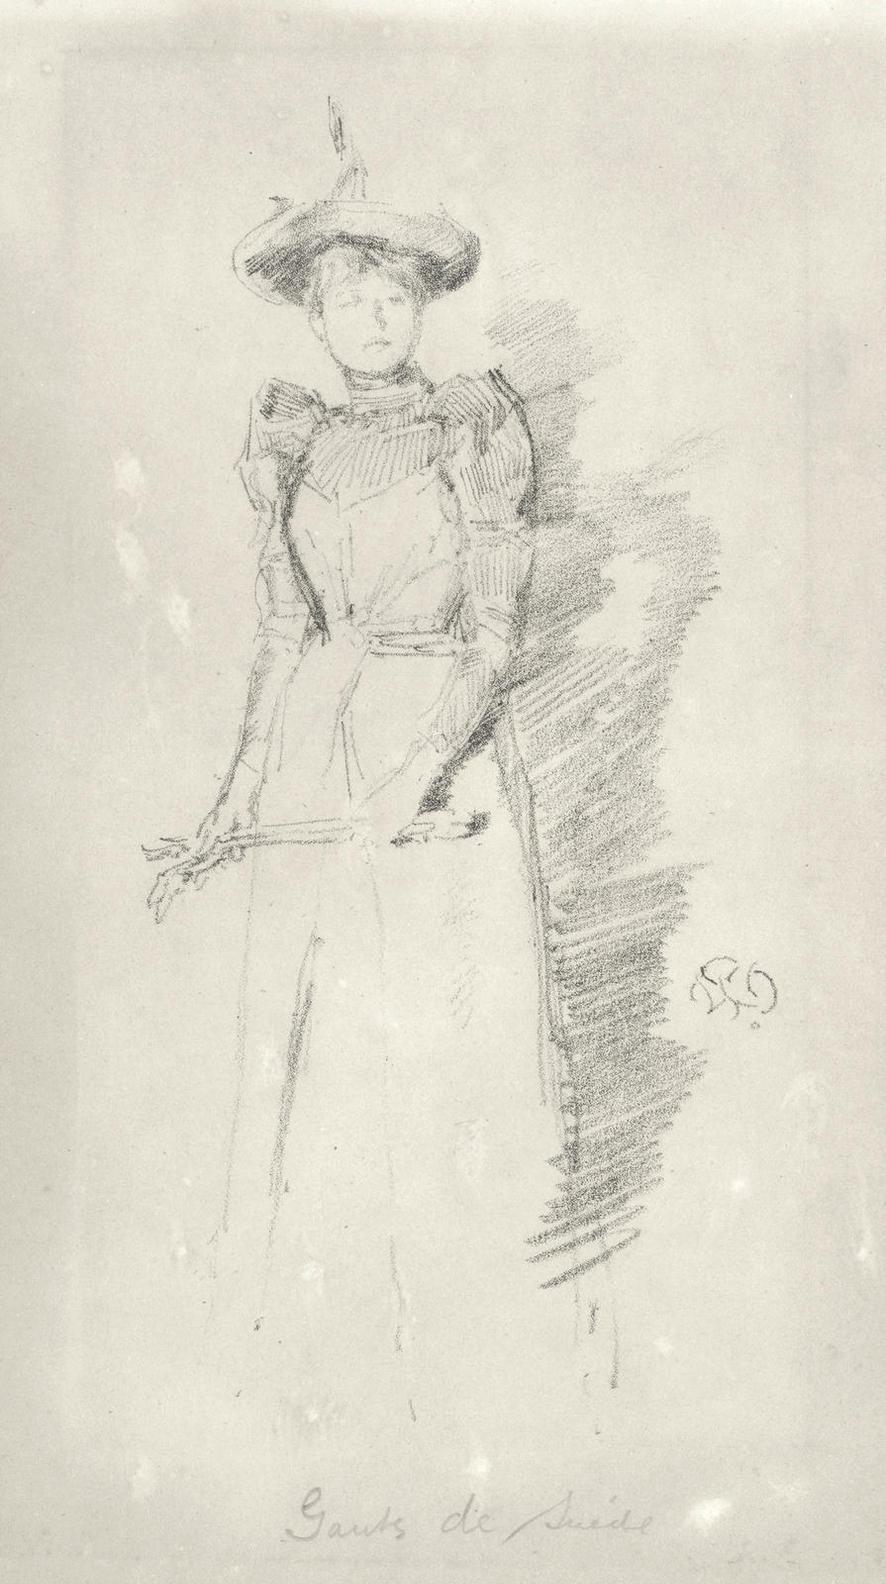 James Abbott McNeill Whistler-Gants De Suede (Spink, Stratis & Tedeschi 35)-1890